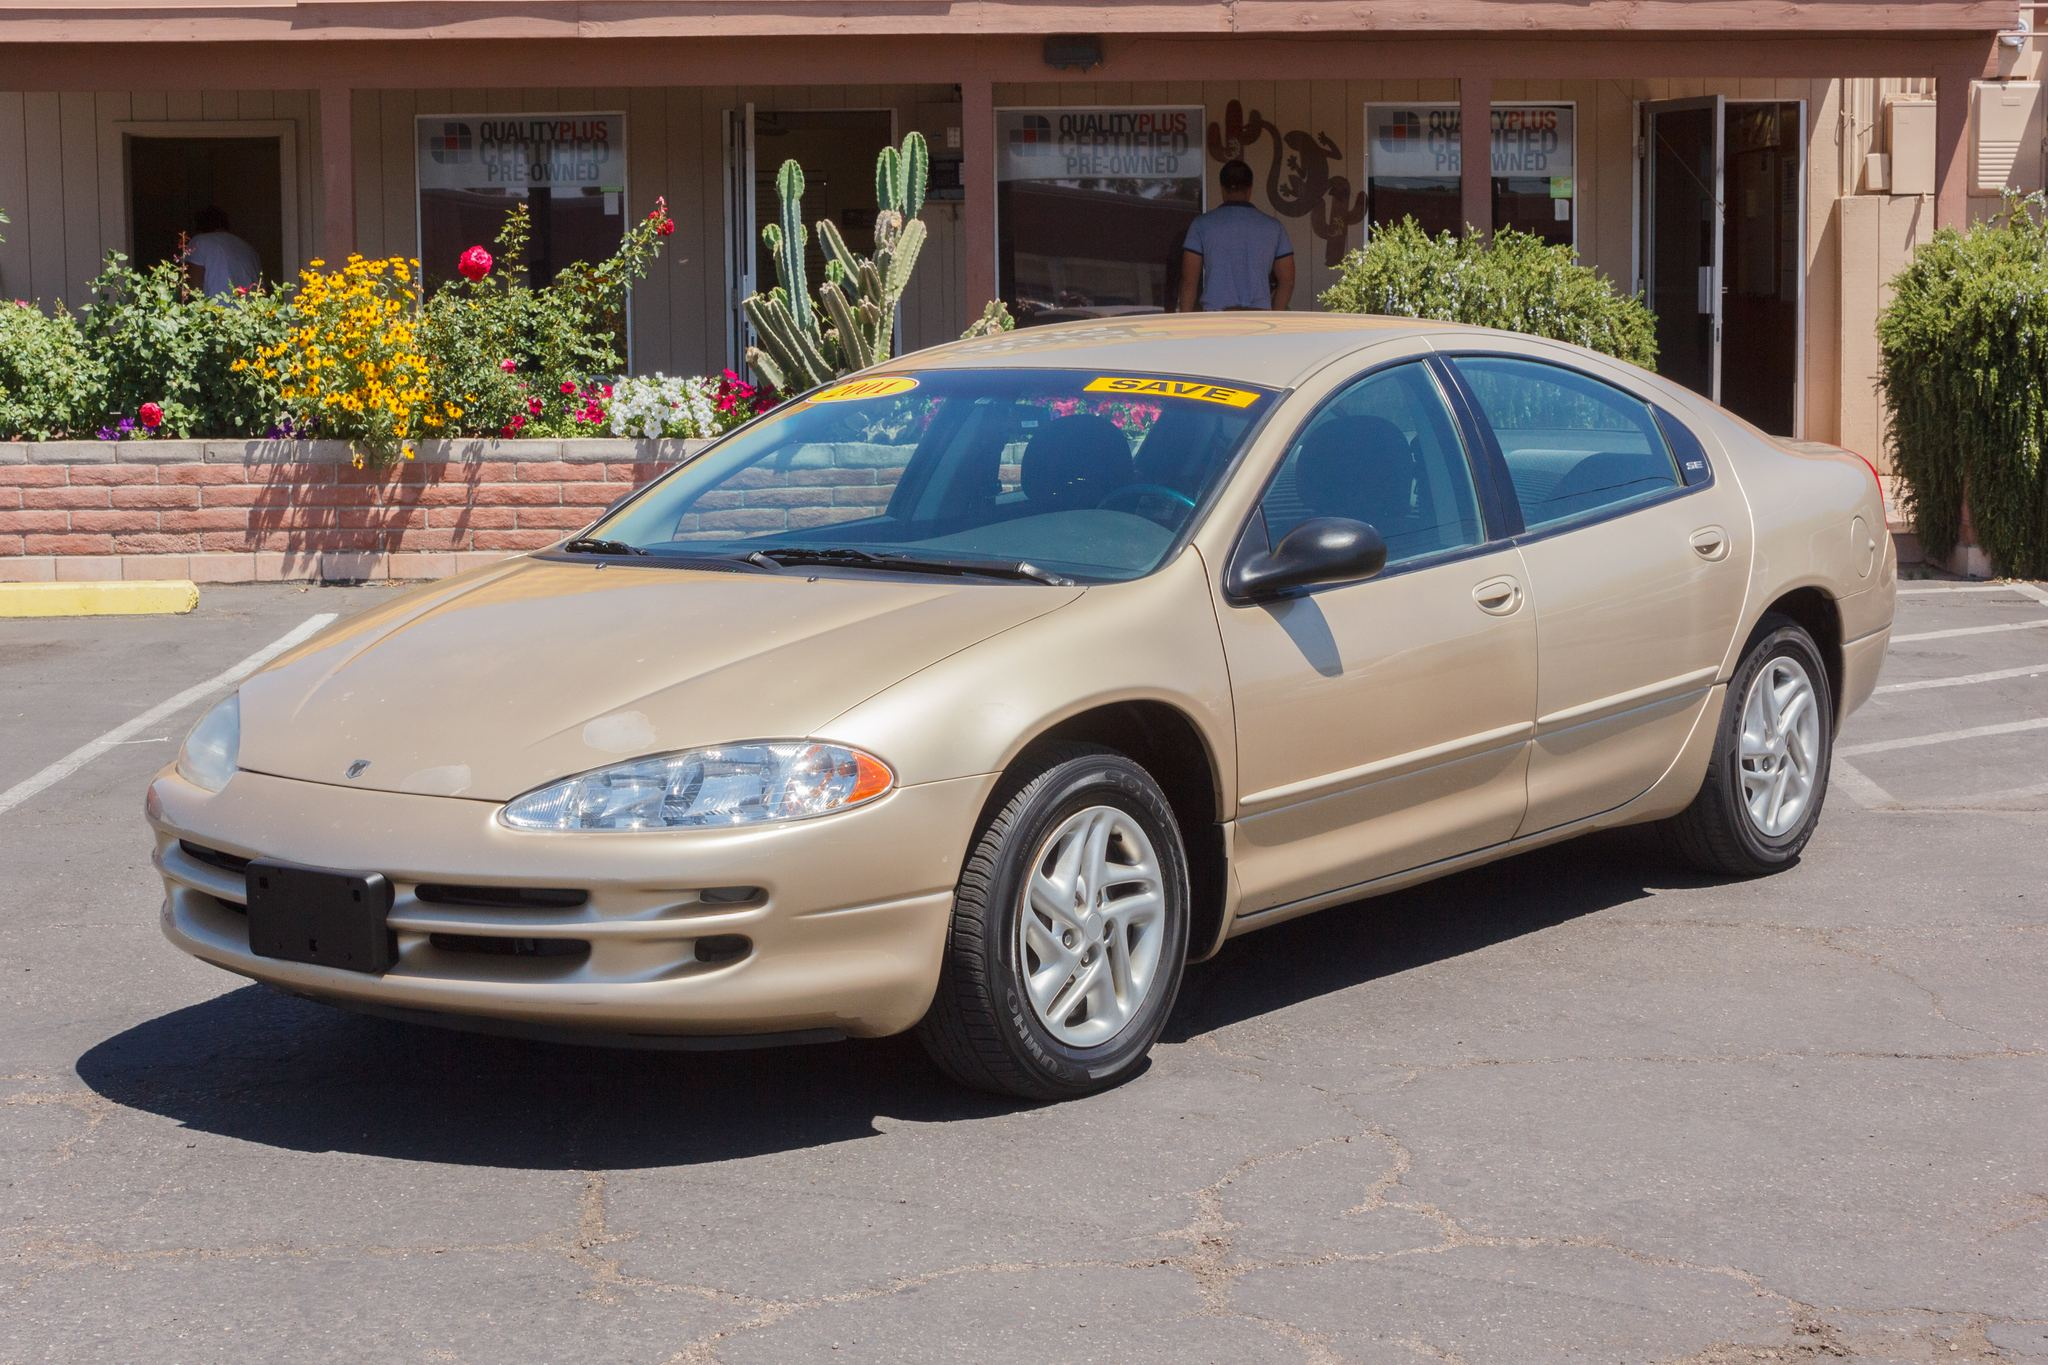 Photo of 2001 Dodge Intrepid 4d Sedan SE Champagne Pearl Clearcoat